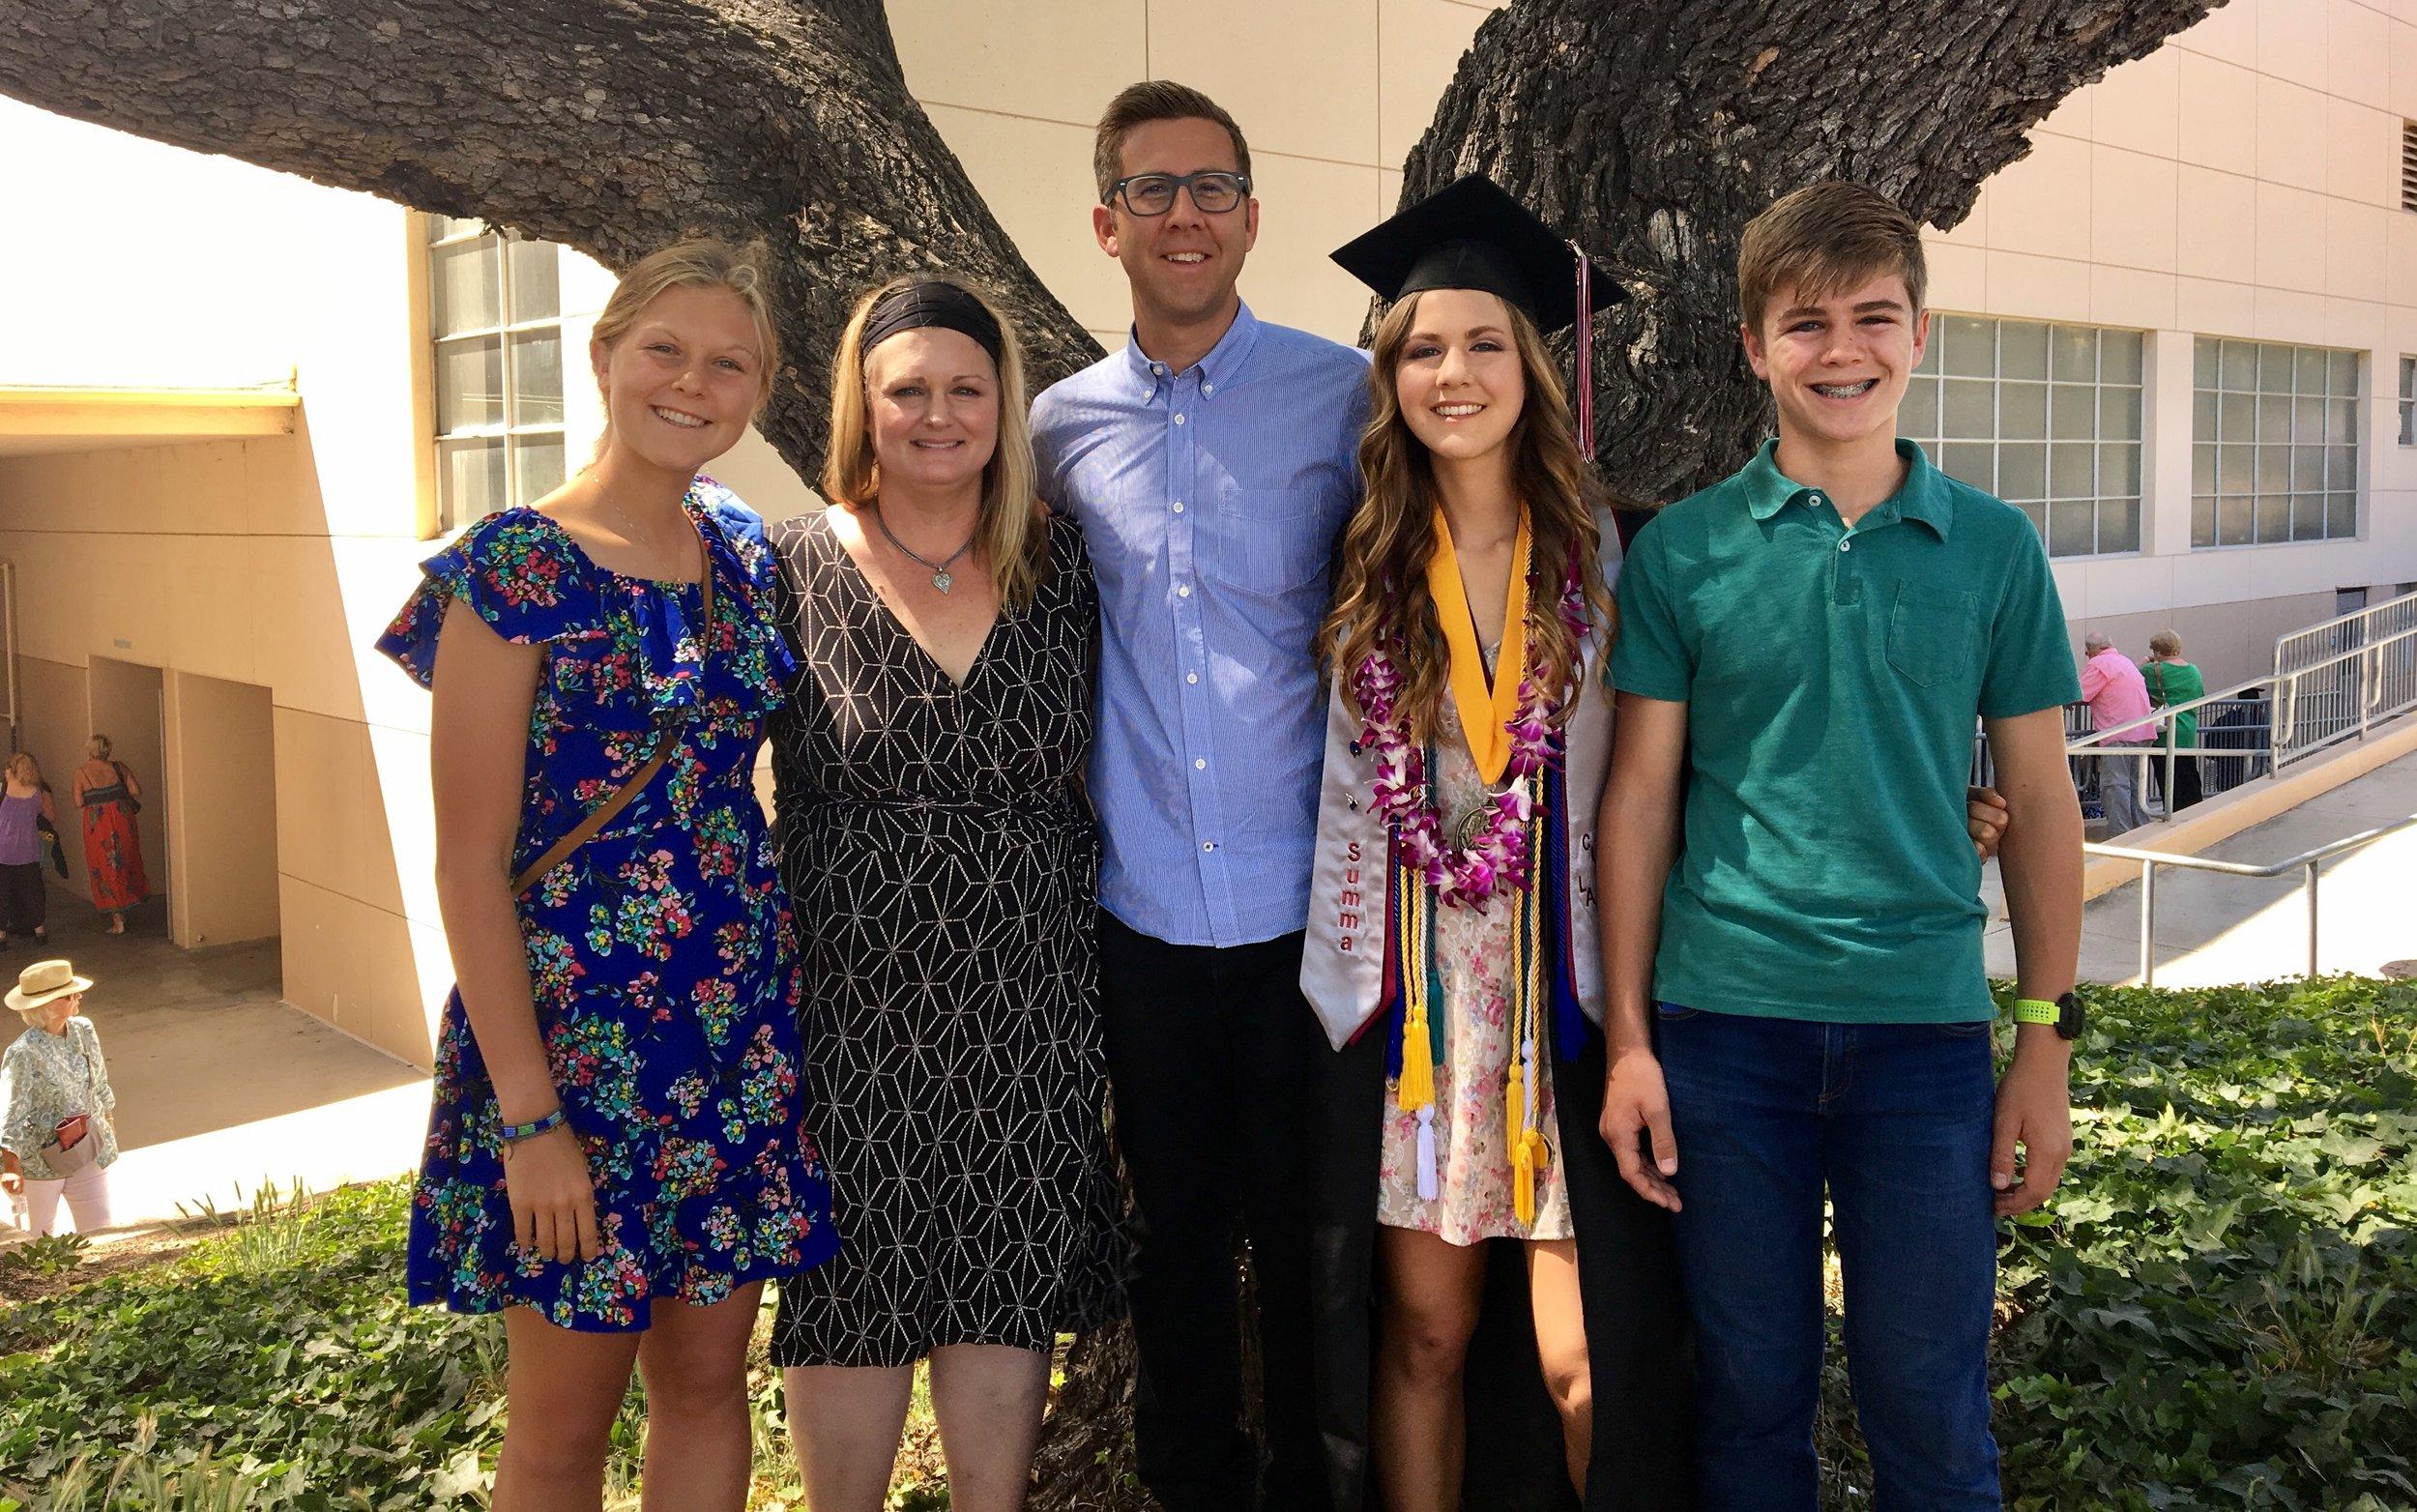 Annika, Jill, David, Emily (The Graduate), Zack